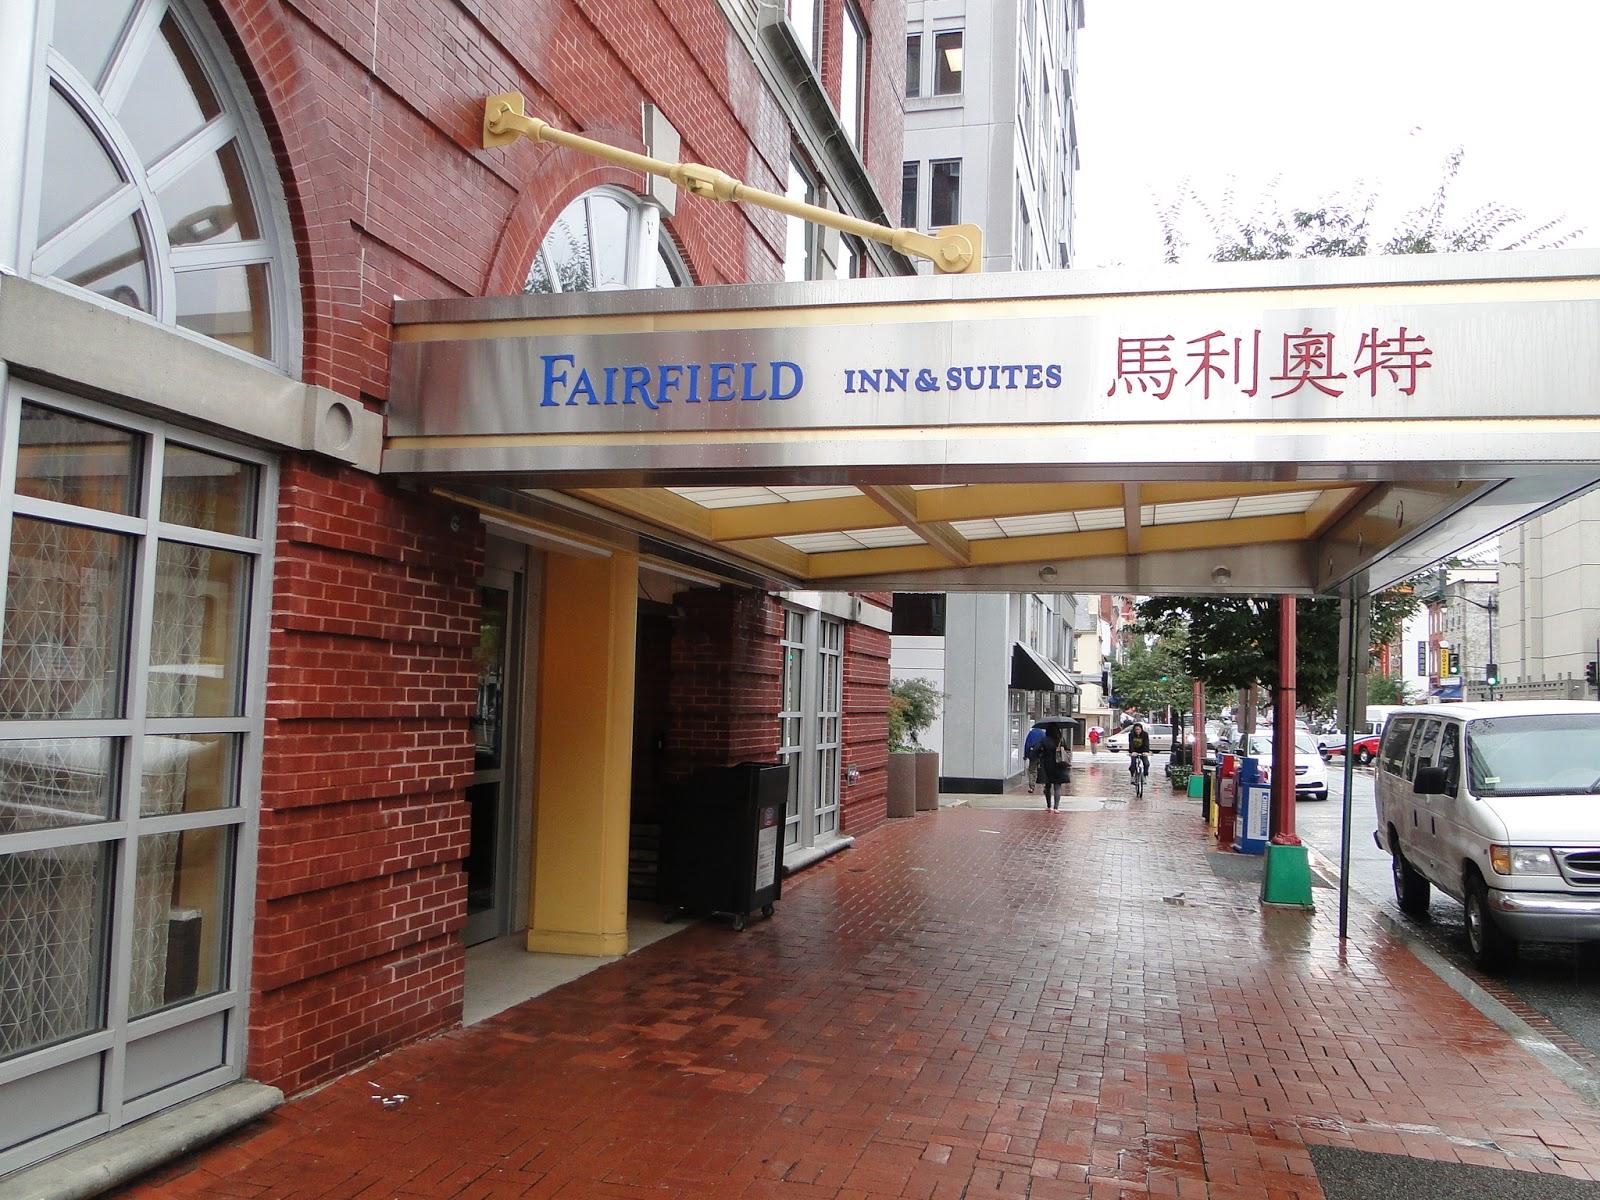 Fairfield Inn & Suites (Washington, USA) | A traveling